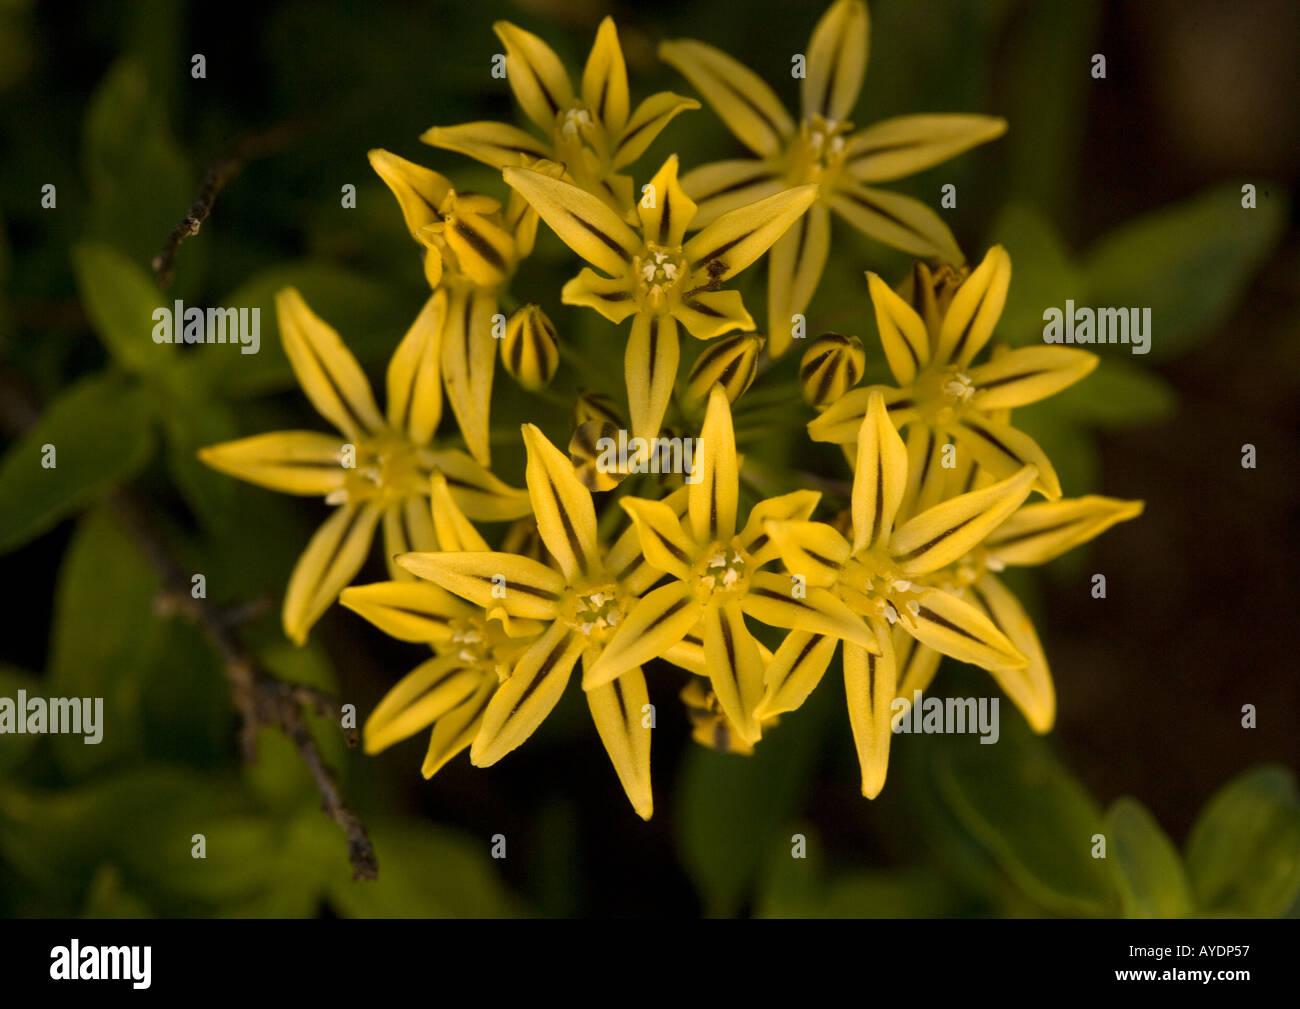 Pretty Face Triteleia Ixioides In Flower Old Name Was Brodiaea